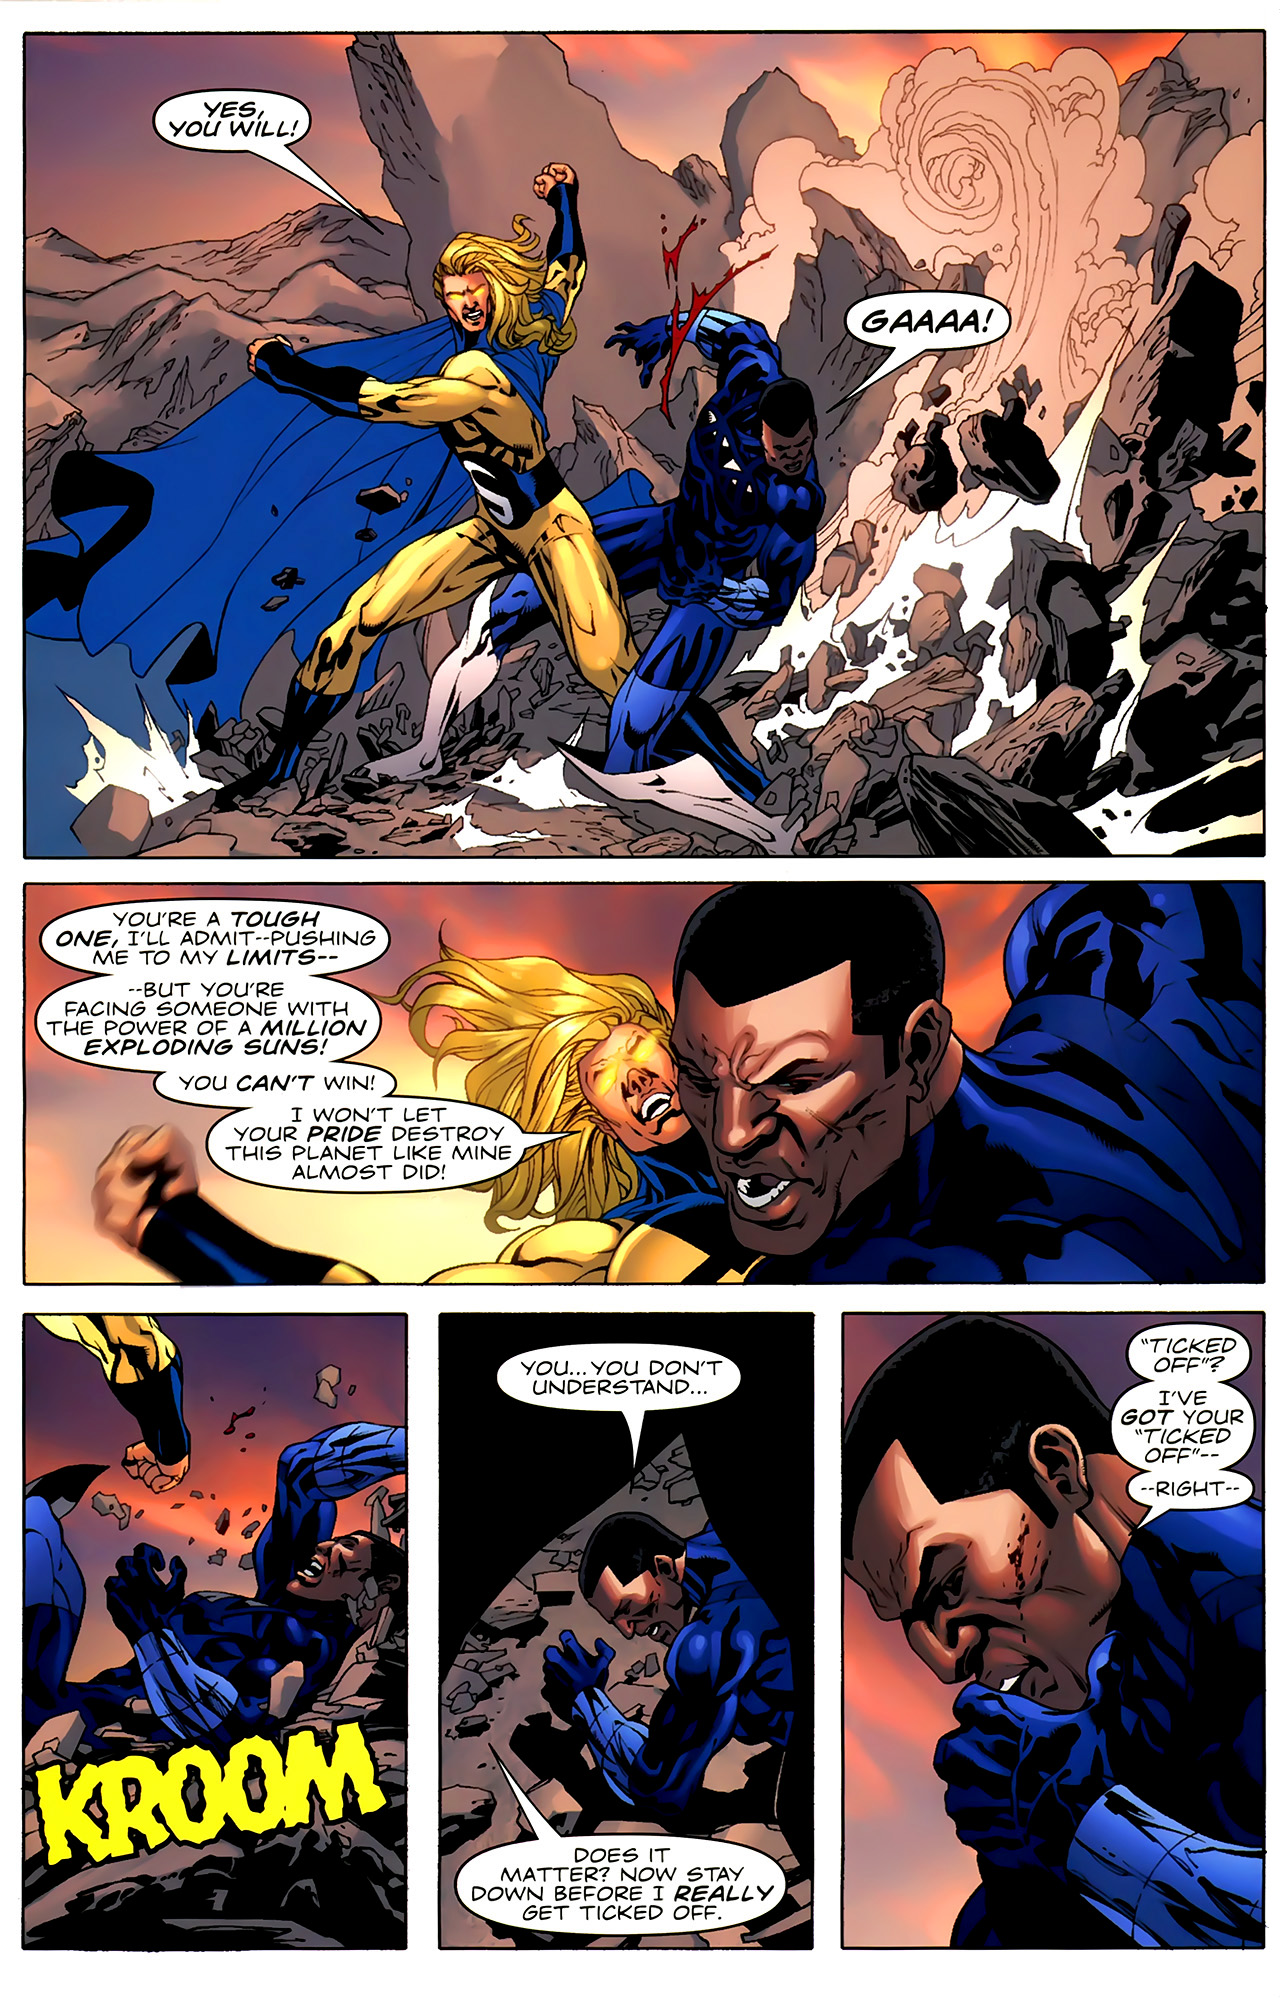 Goku In Marvelverse Page 2 Spacebattles Forums